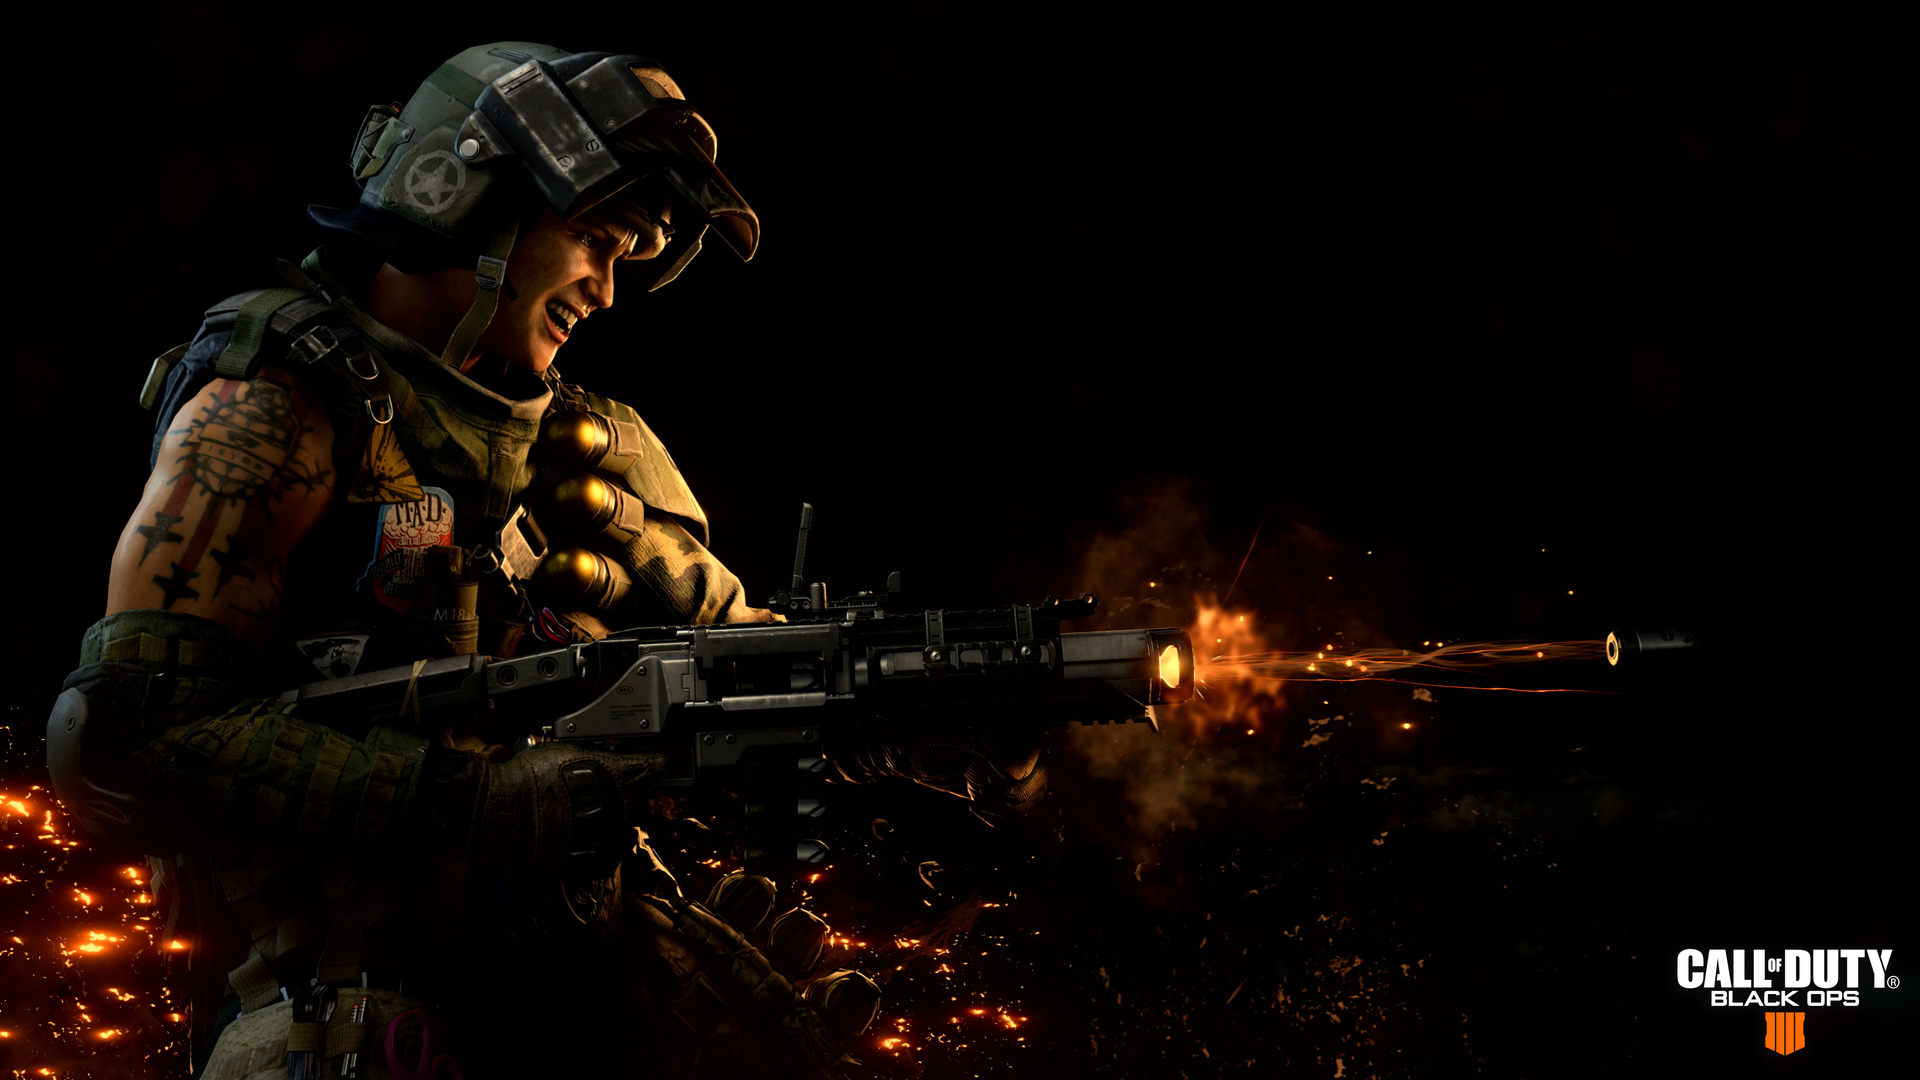 1920x1080 Call Of Duty Black Ops 4 4k Laptop Full Hd 1080p